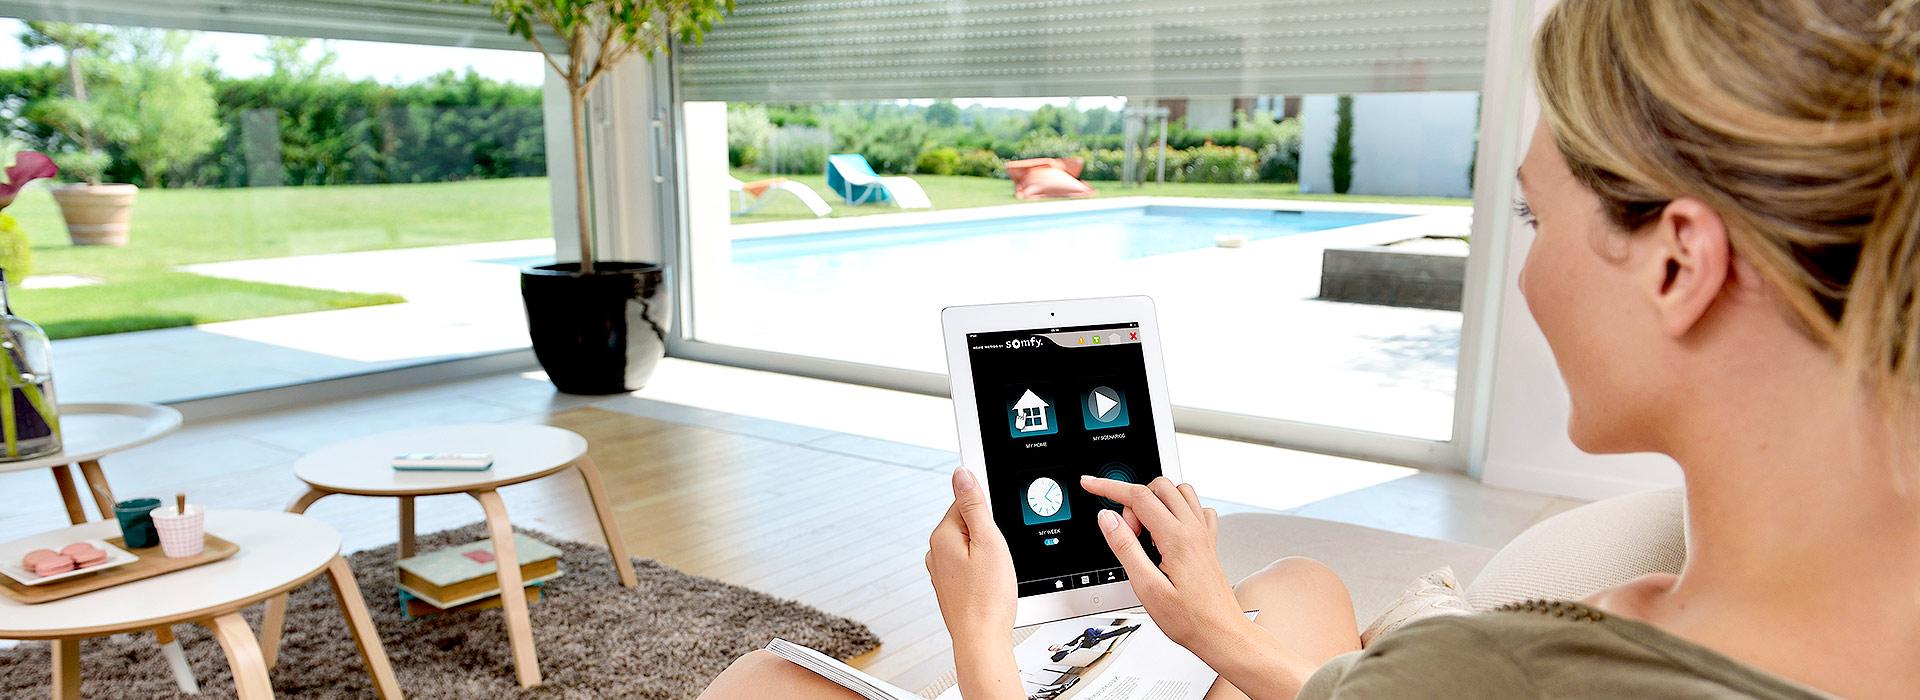 pakiet-smart-home-